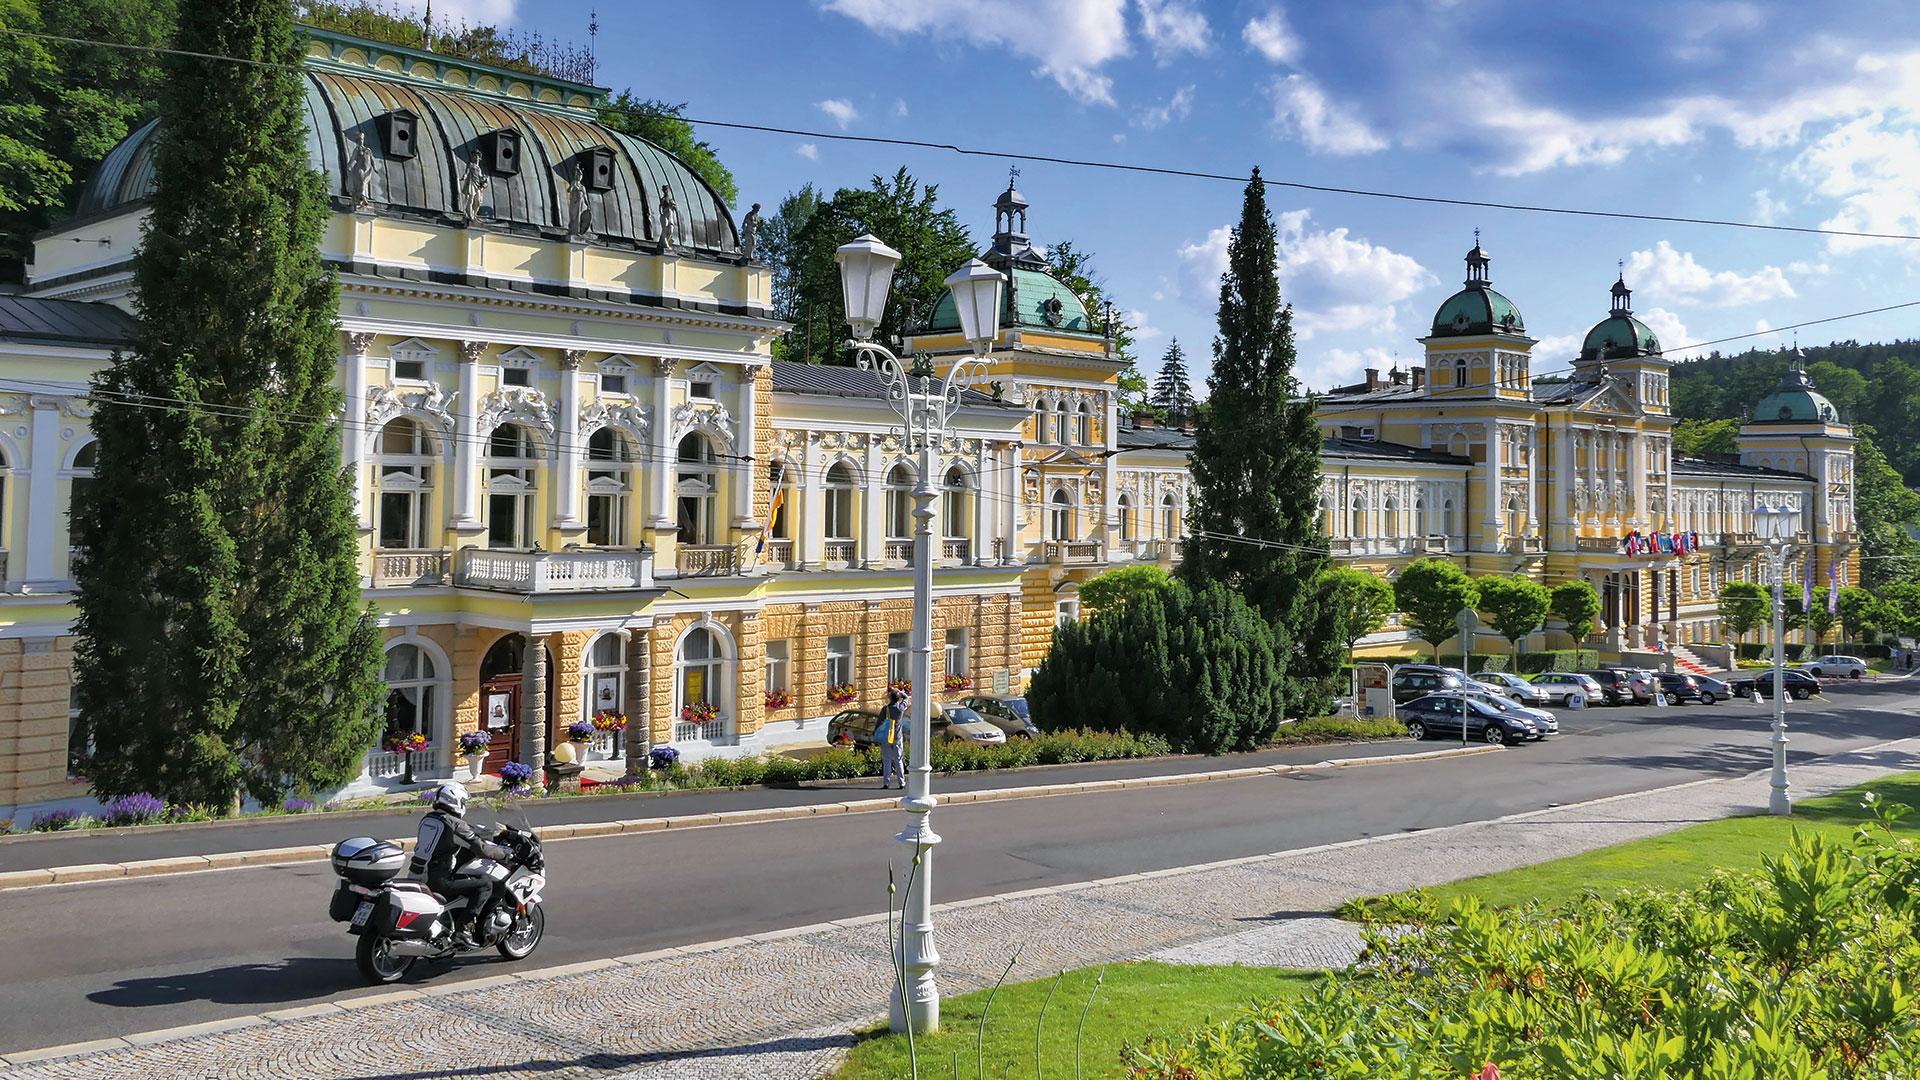 Burg-Festspiele - Tour 2